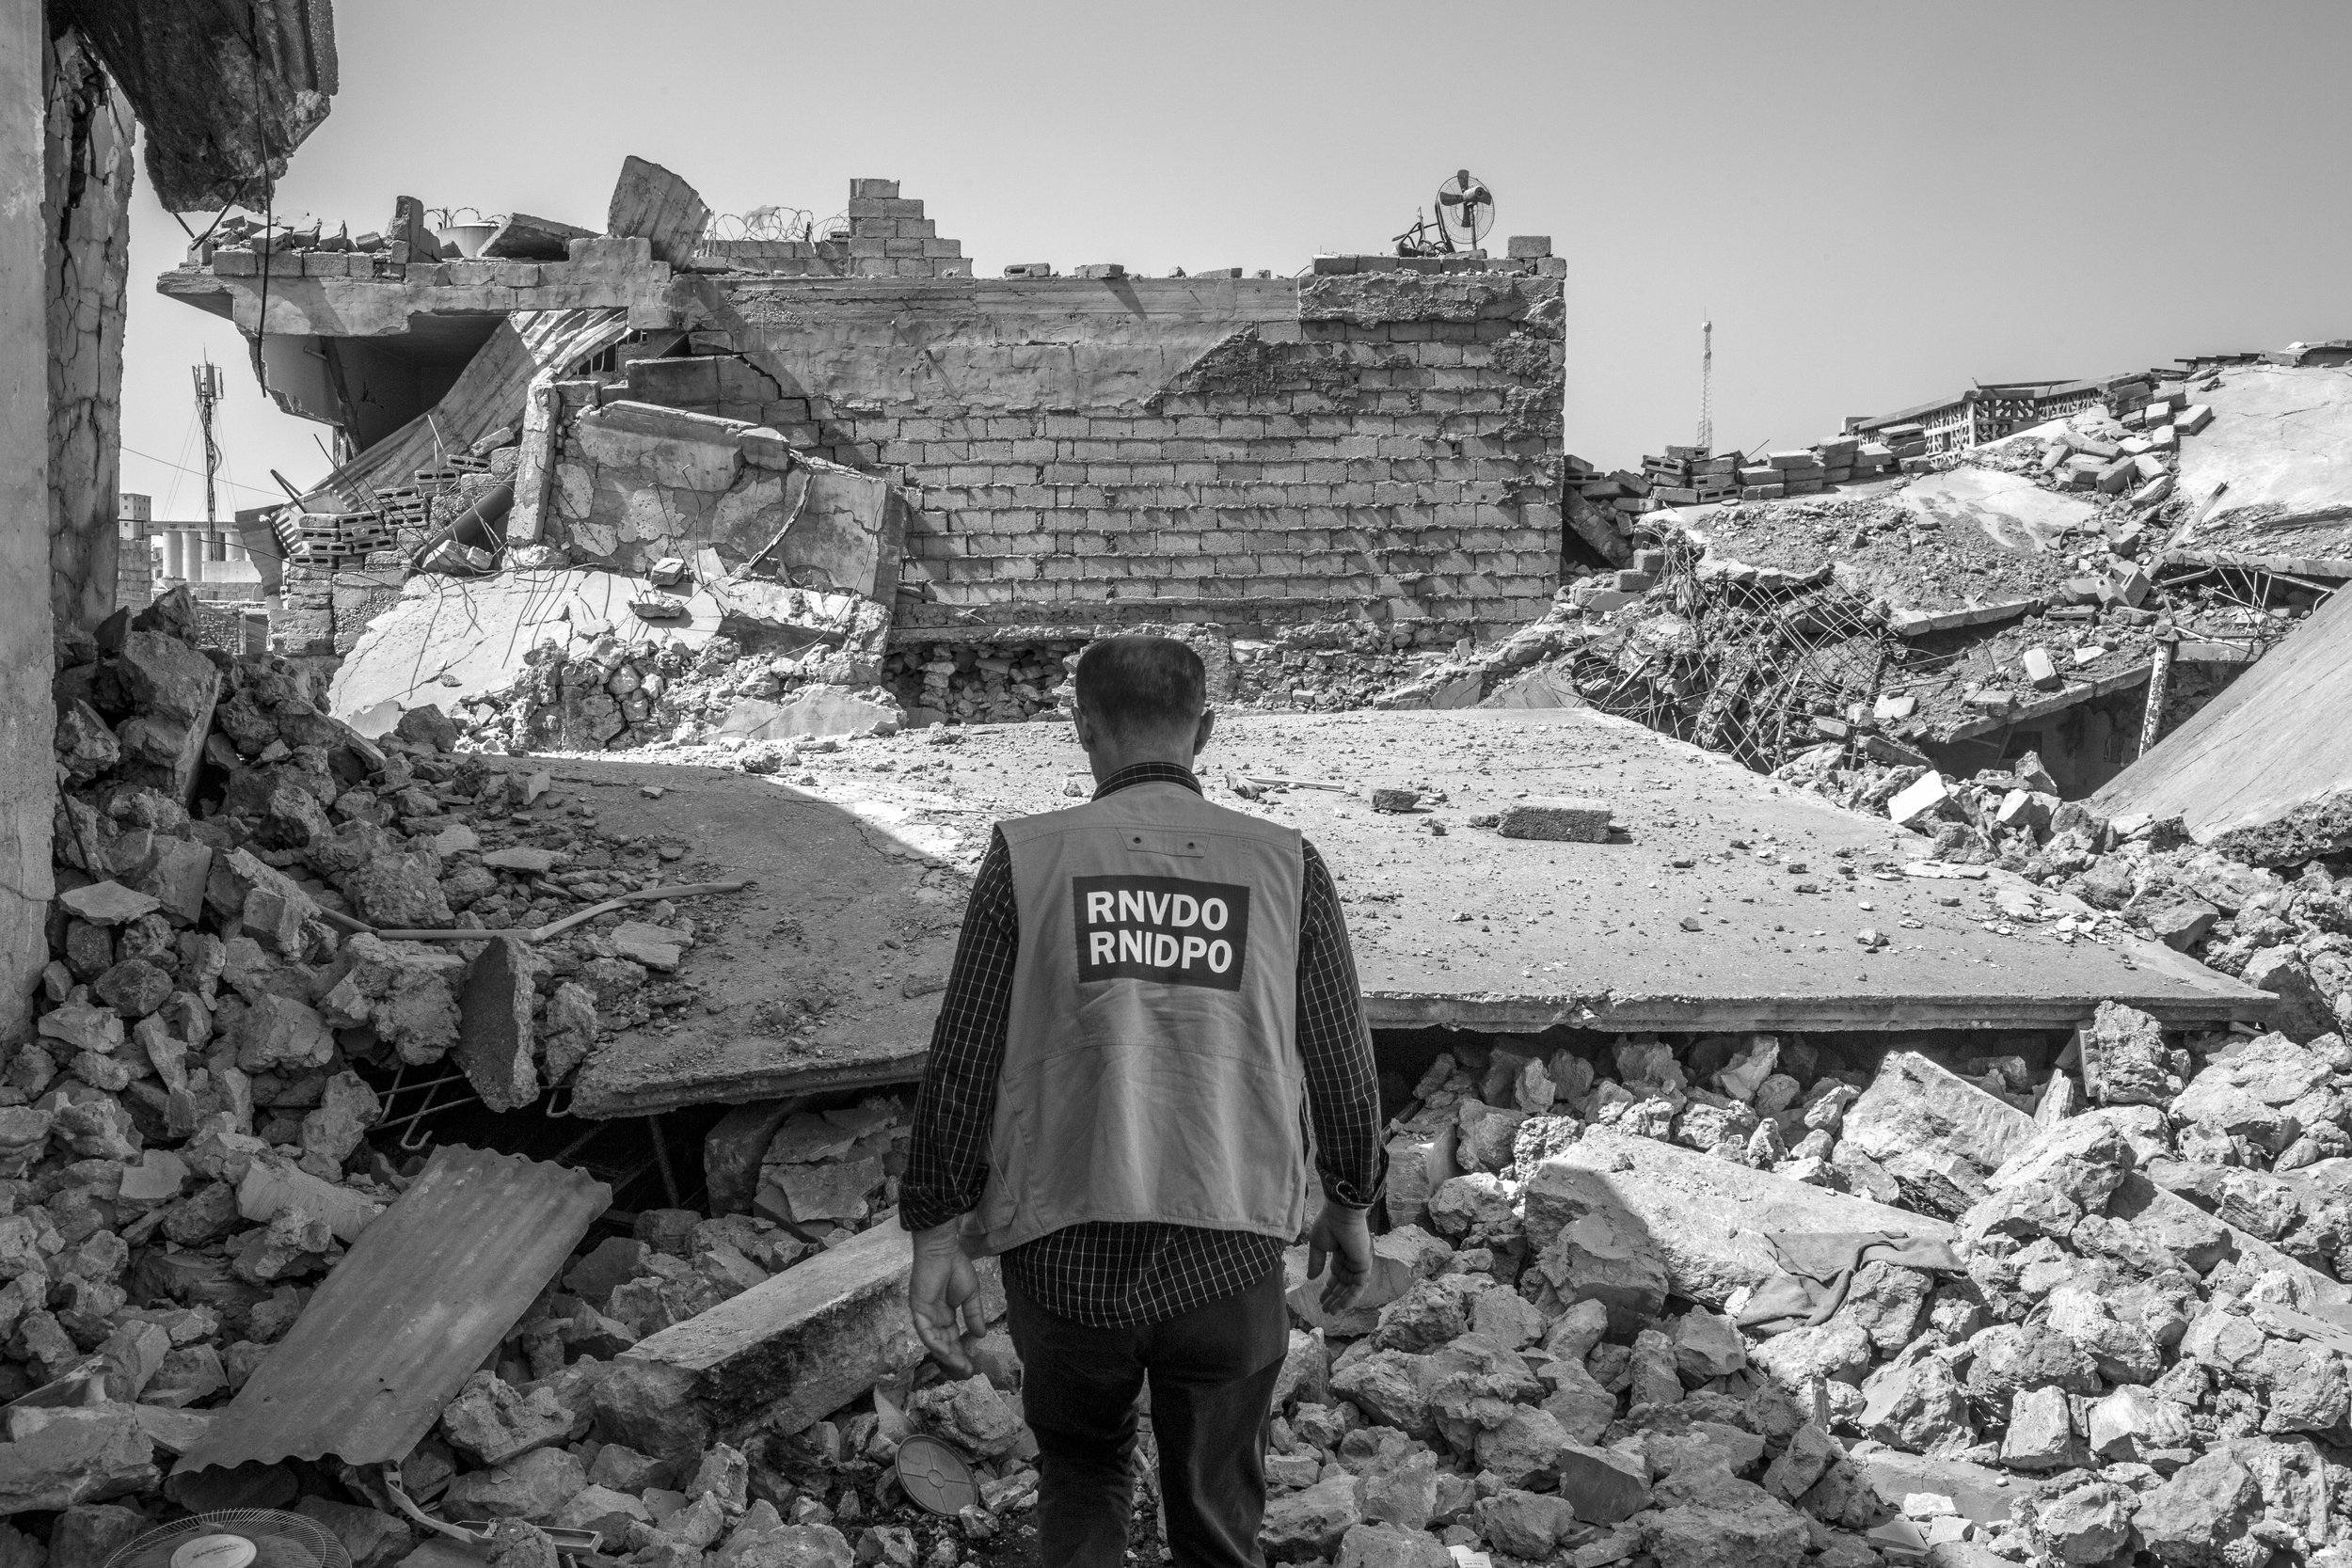 A member of an Iraqi partner organization surveys rubble in West Mosul.